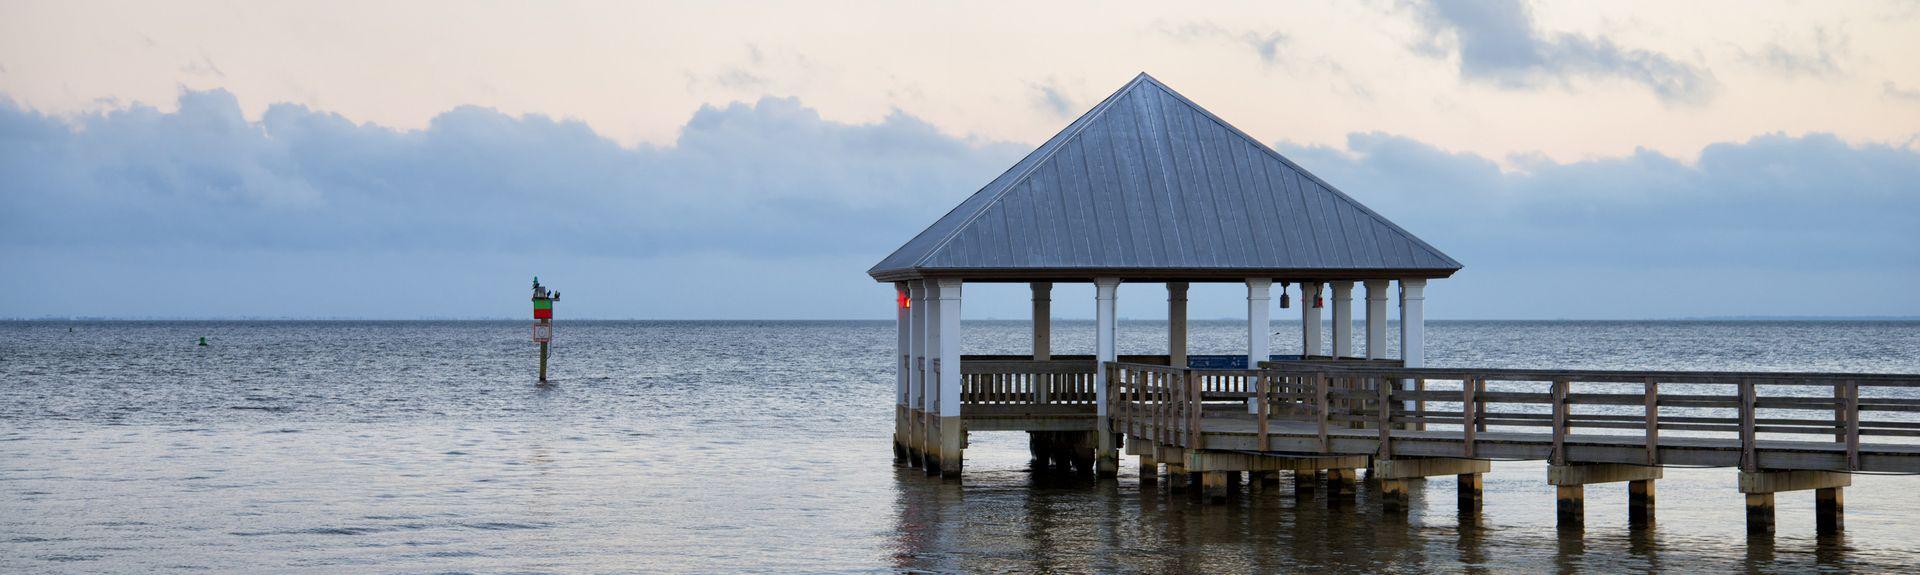 Apalachicola, Florida, United States of America